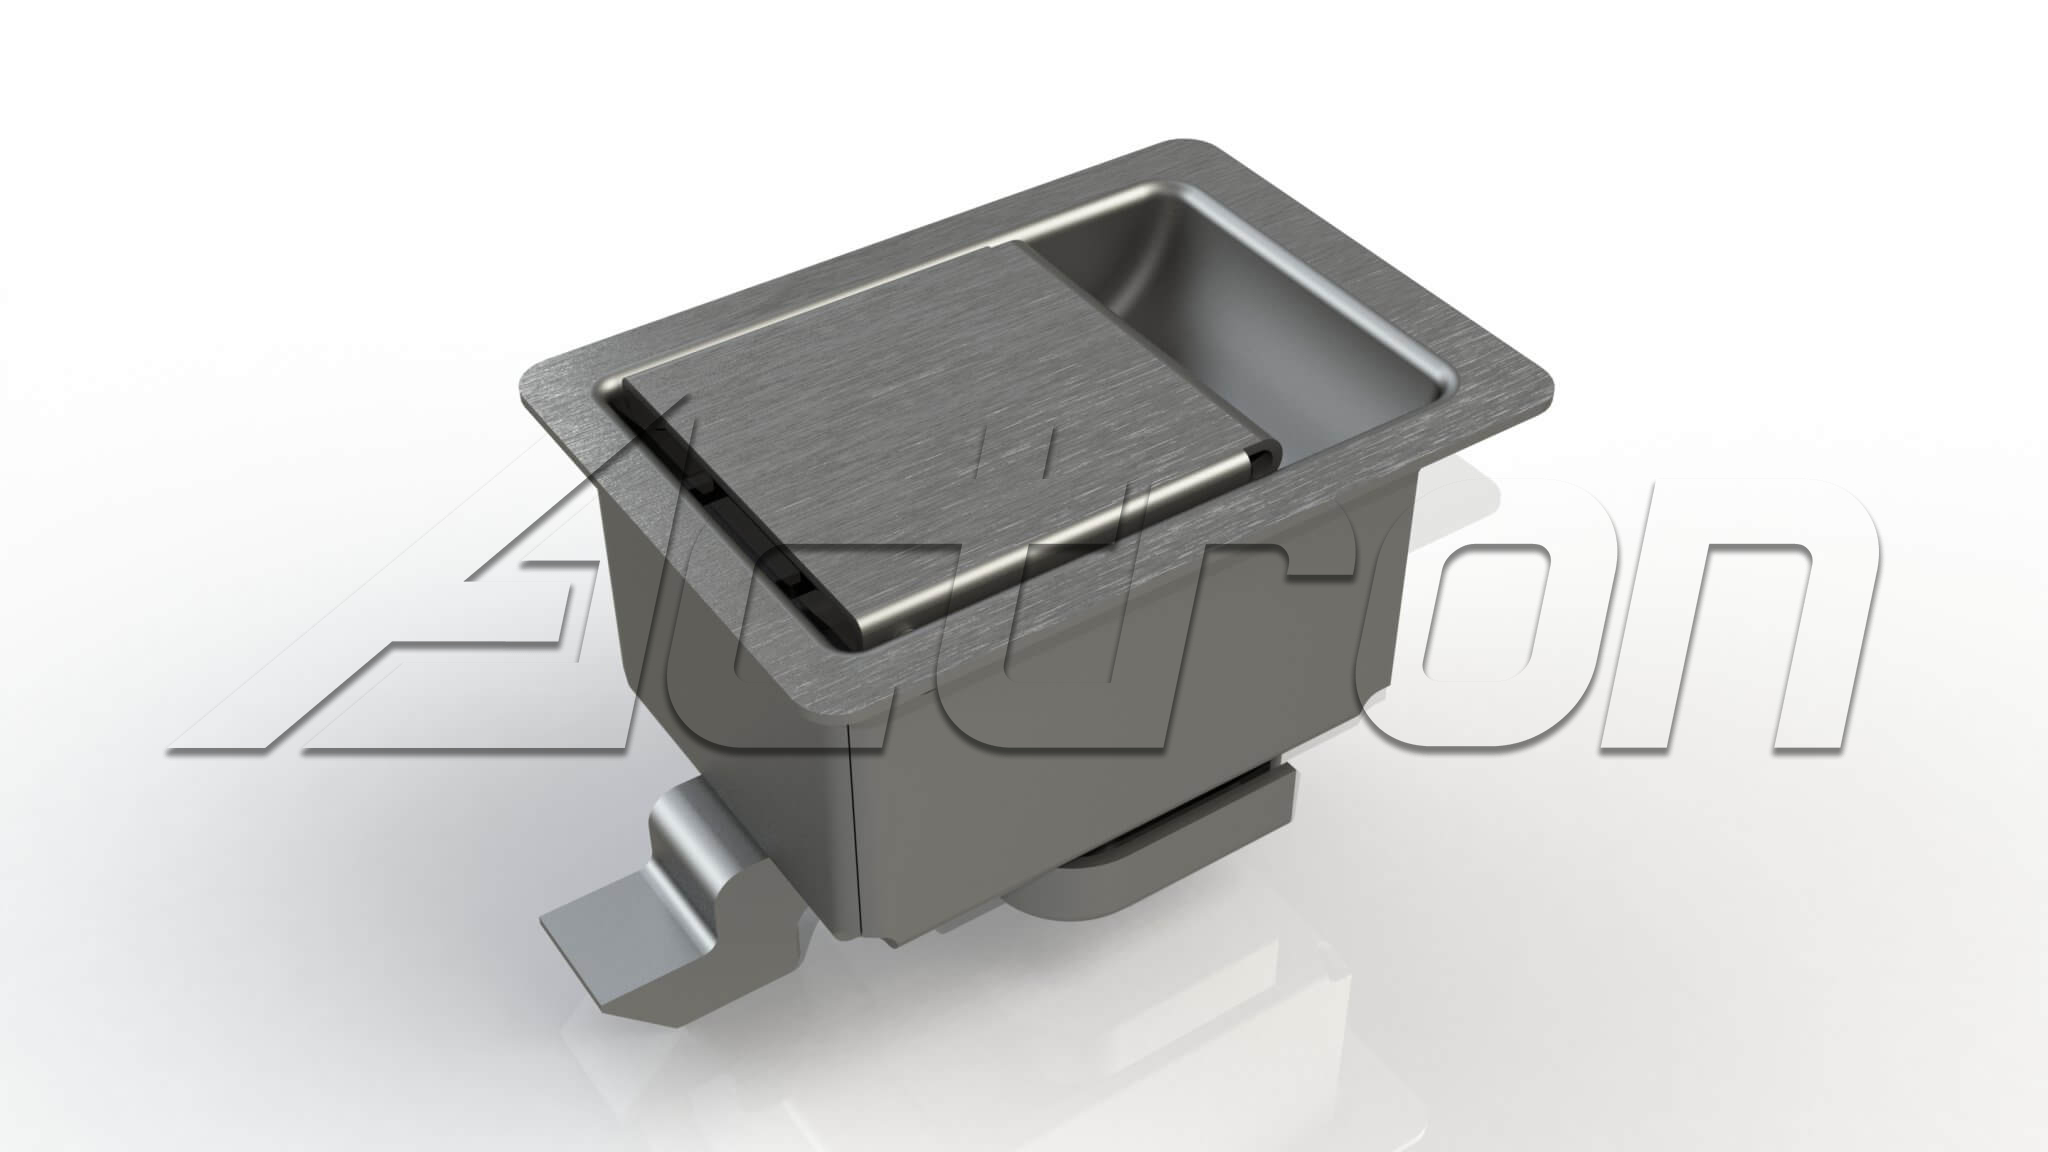 latch-assy-8211-paddle-4268-a23116.jpg